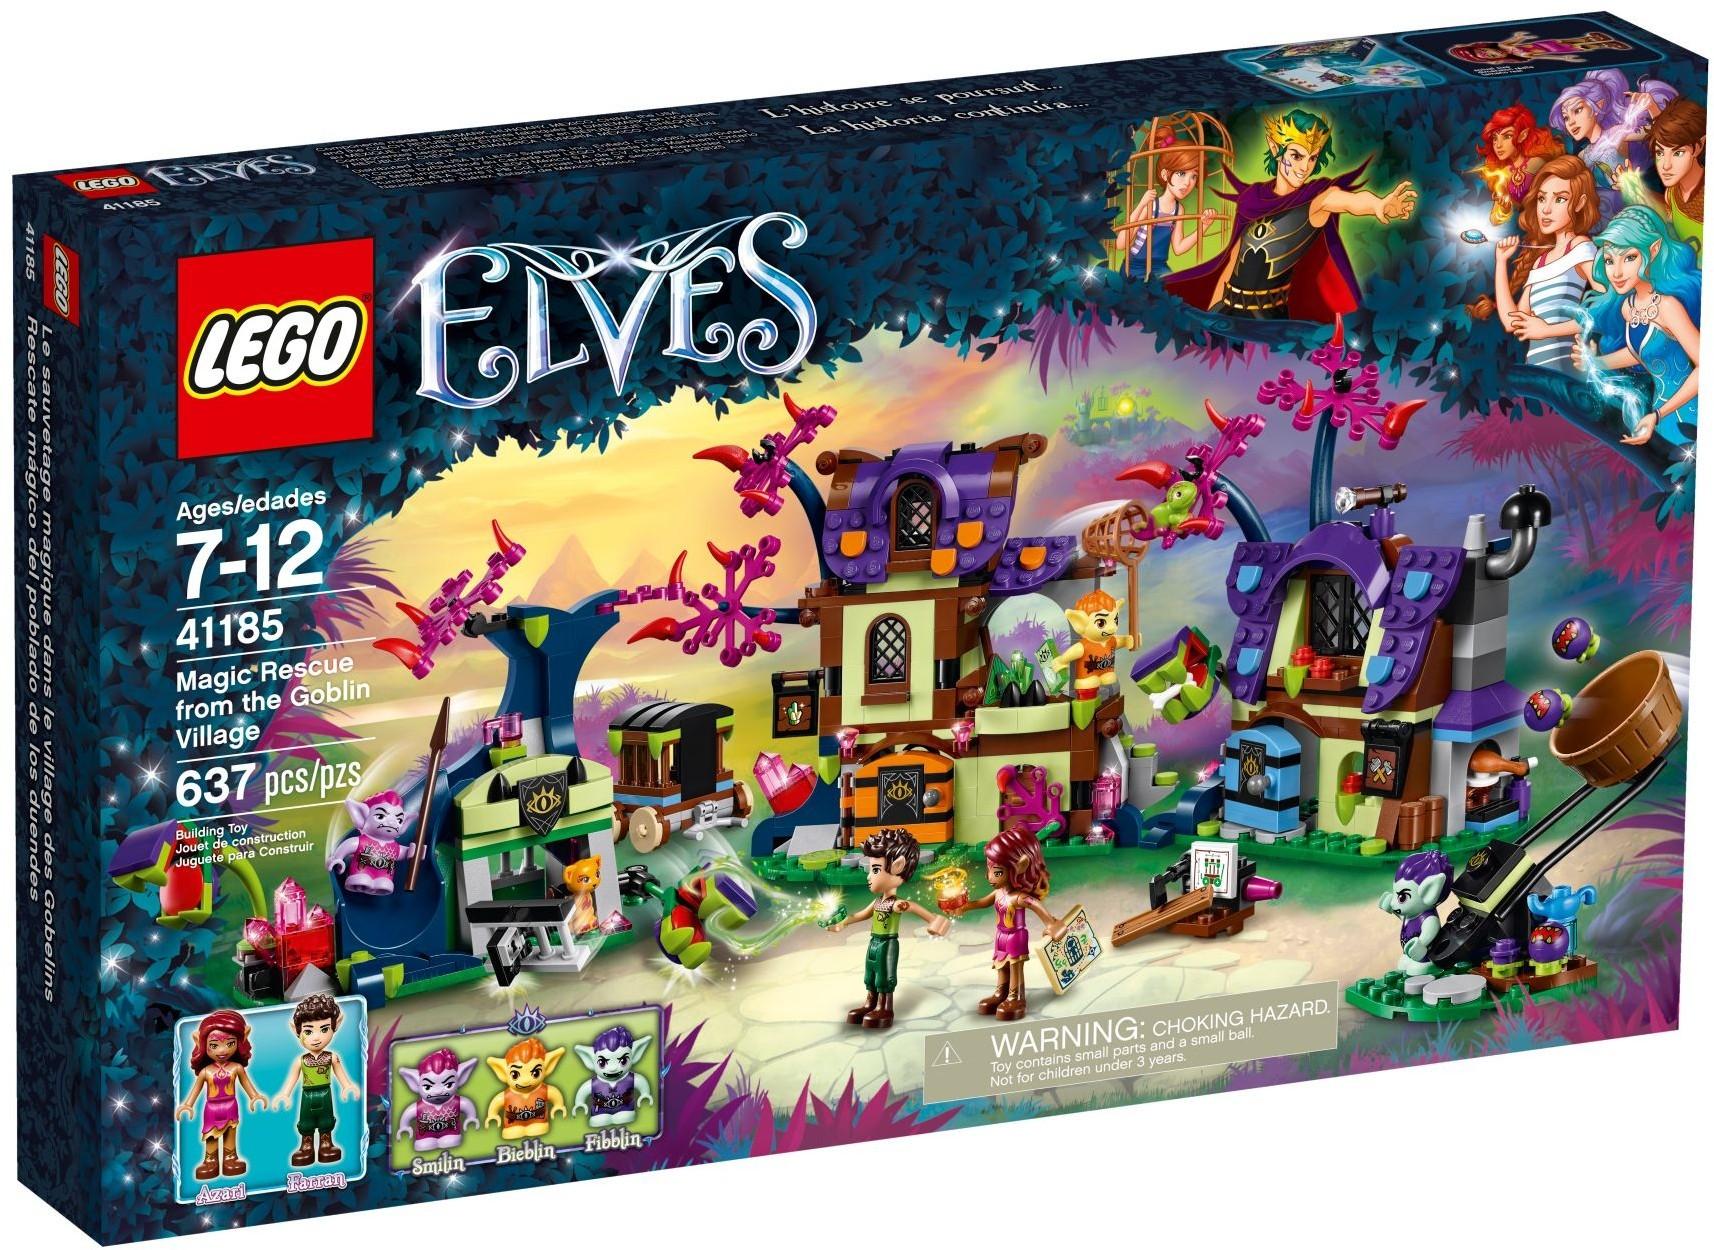 Lego Elves 41185 Magic Rescue from the Goblin Village LEGO konstruktors